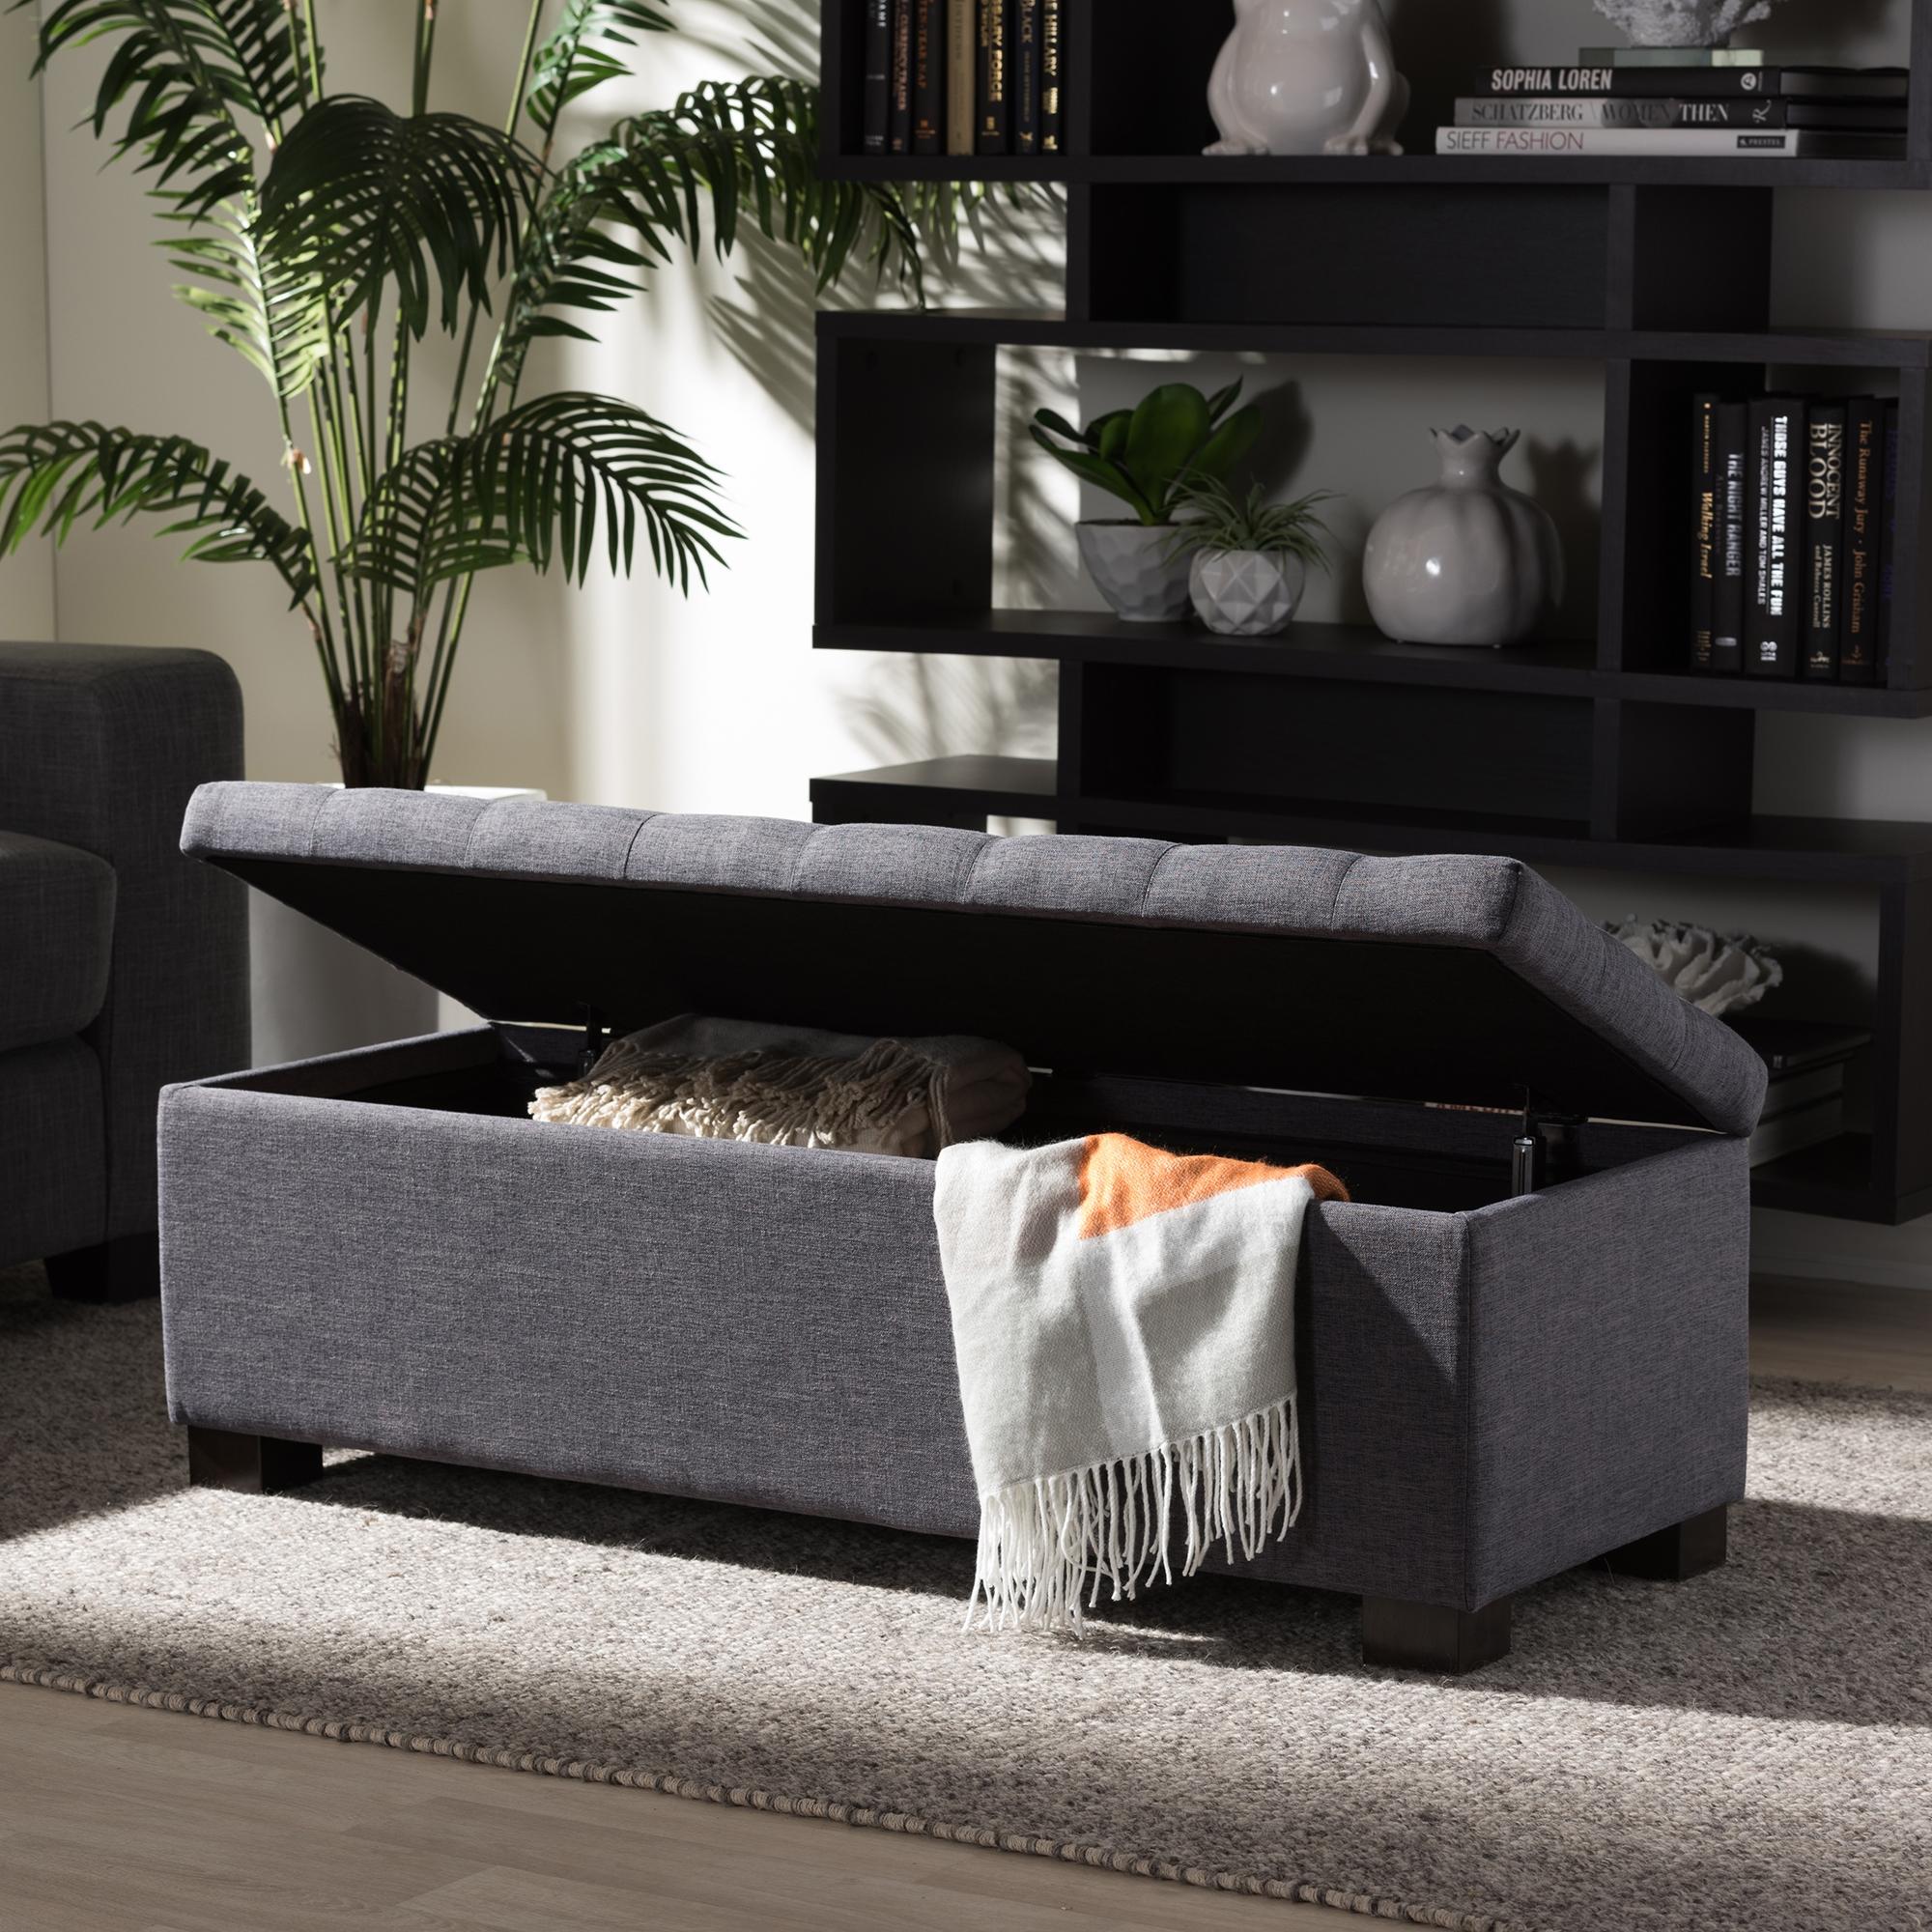 ... Baxton Studio Roanoke Modern And Contemporary Dark Grey Fabric  Upholstered Grid Tufting Storage Ottoman Bench ...